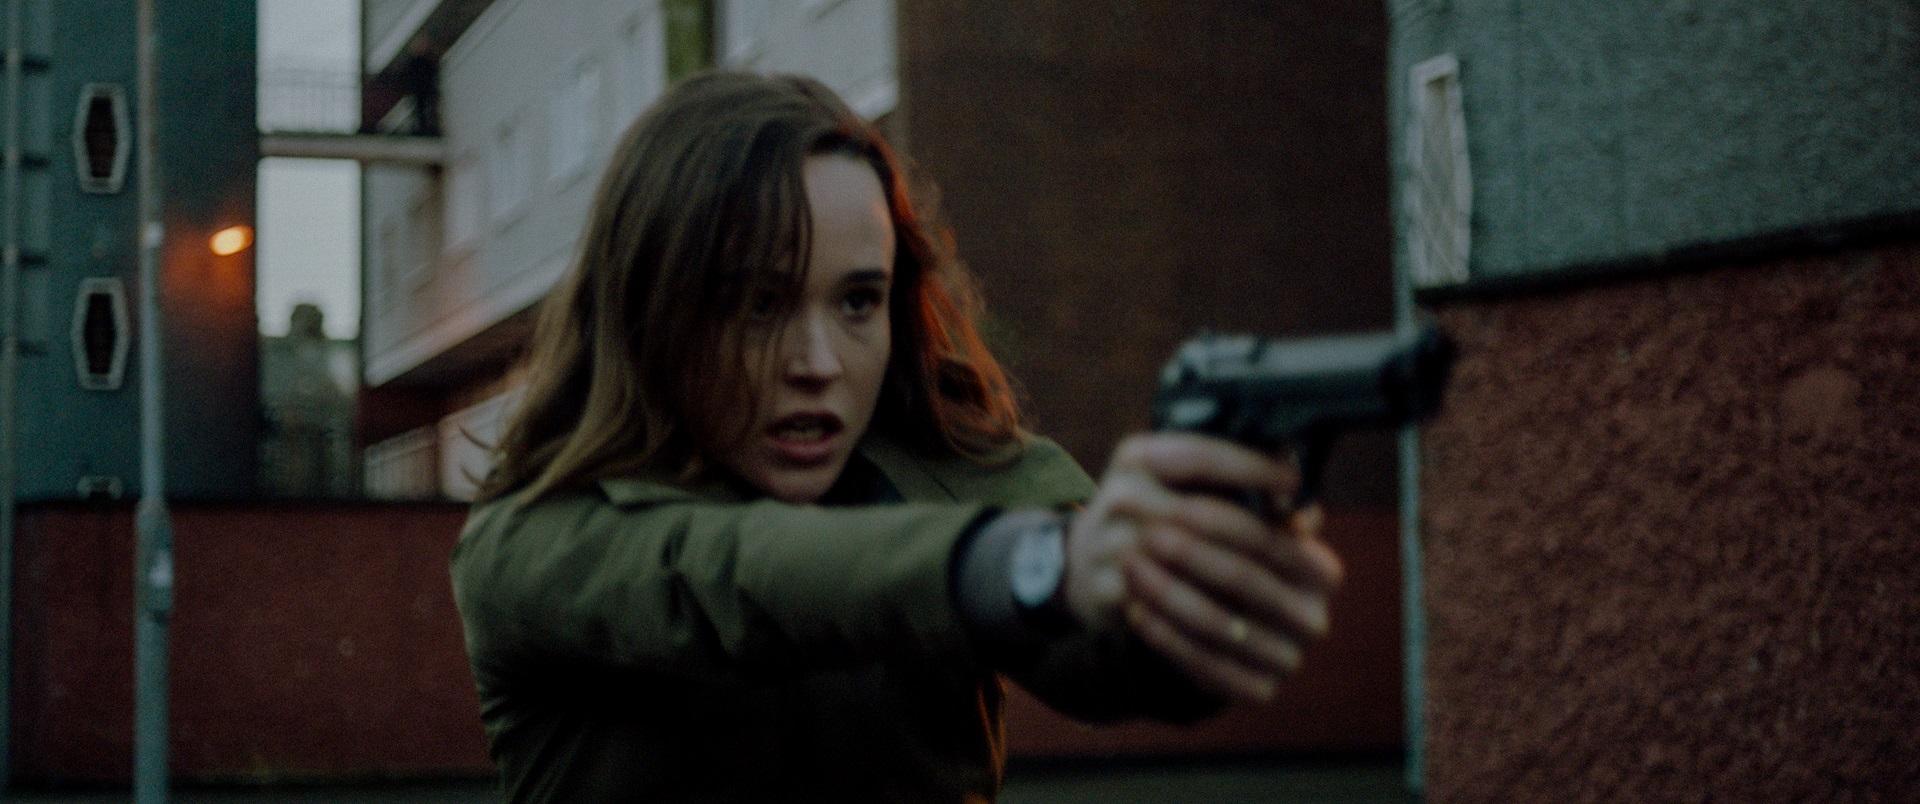 The Cured Ellen Page film capture